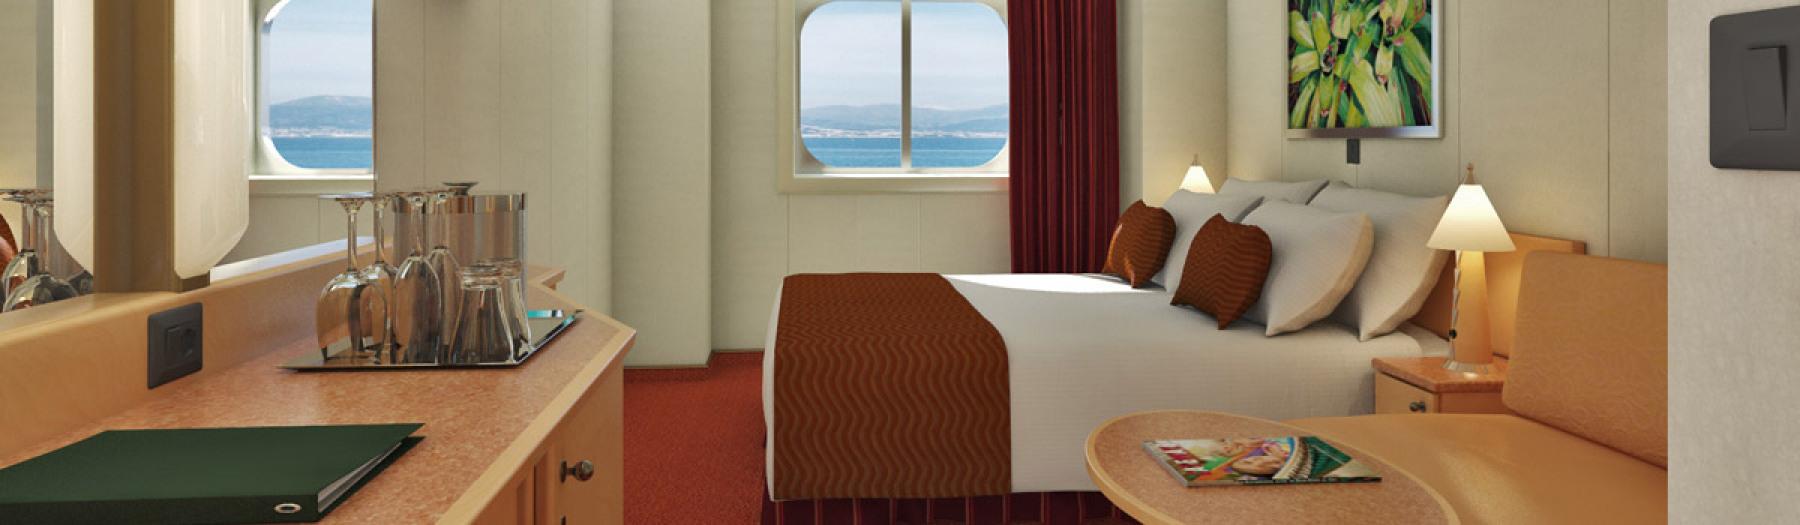 Carnival Cruise Lines Carnival Dream AccommodationDeluxe Ocean View .jpg